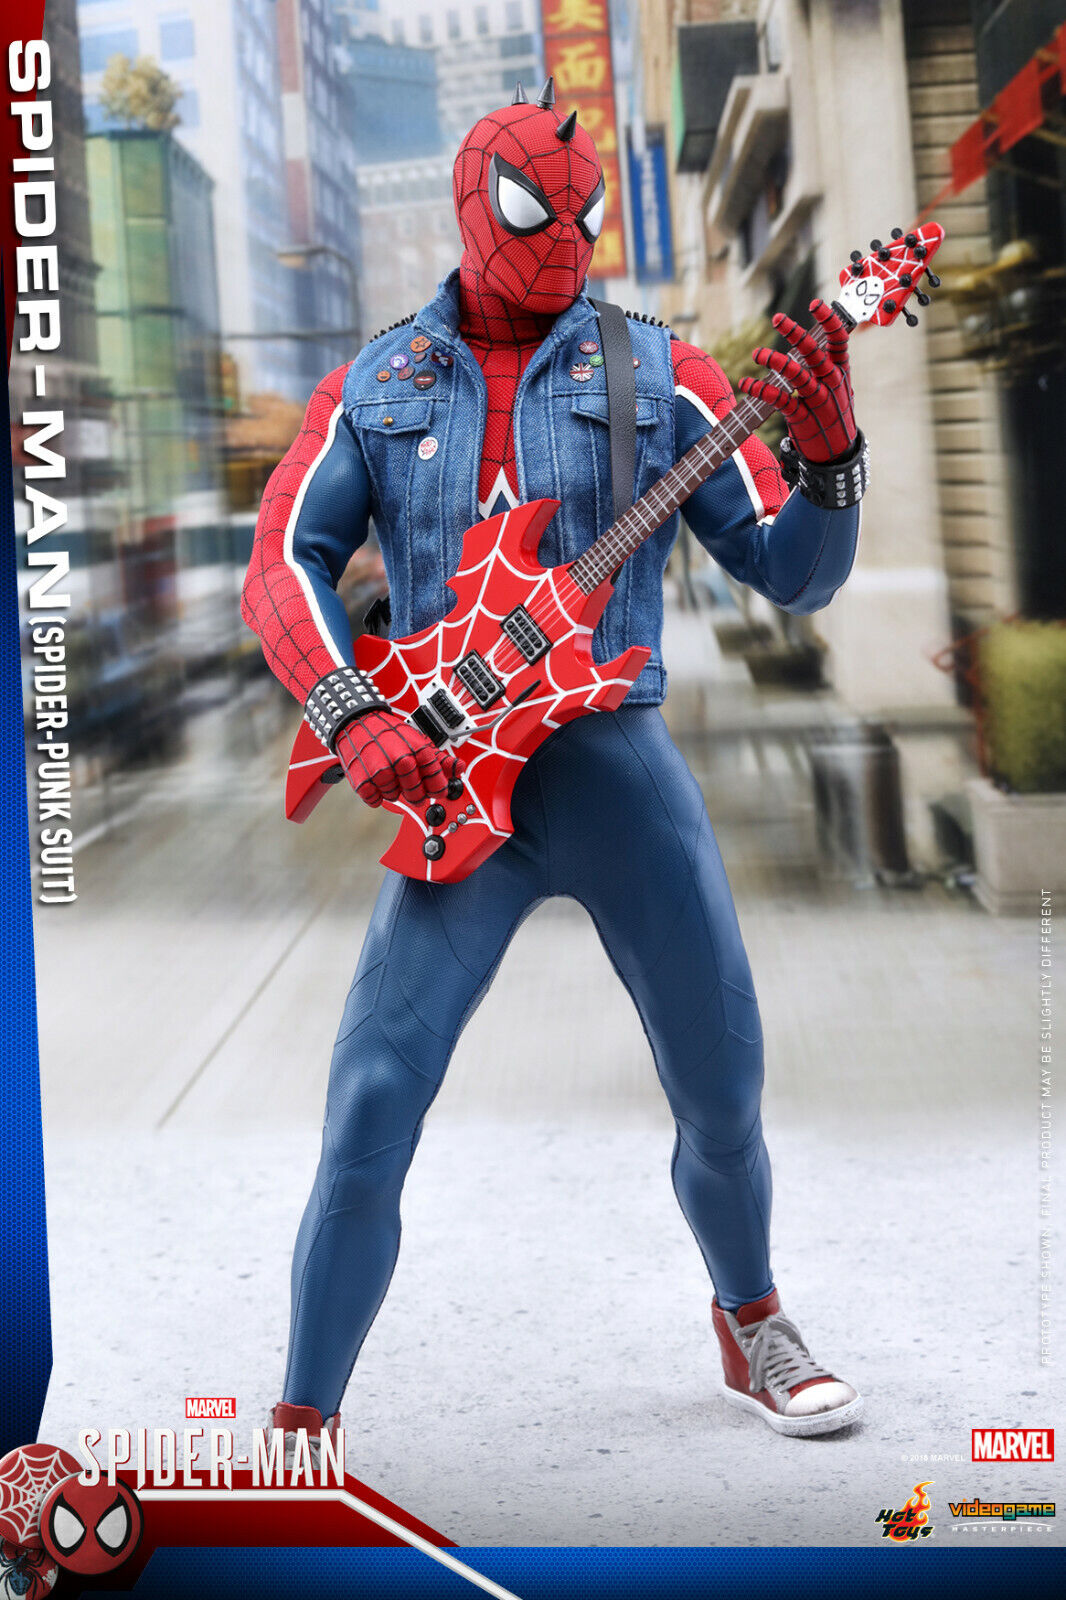 Hot Toys Spiderman (Spider-Punk Suit) Actionfigur 1 6 Maßstab VGM32 Im Lager